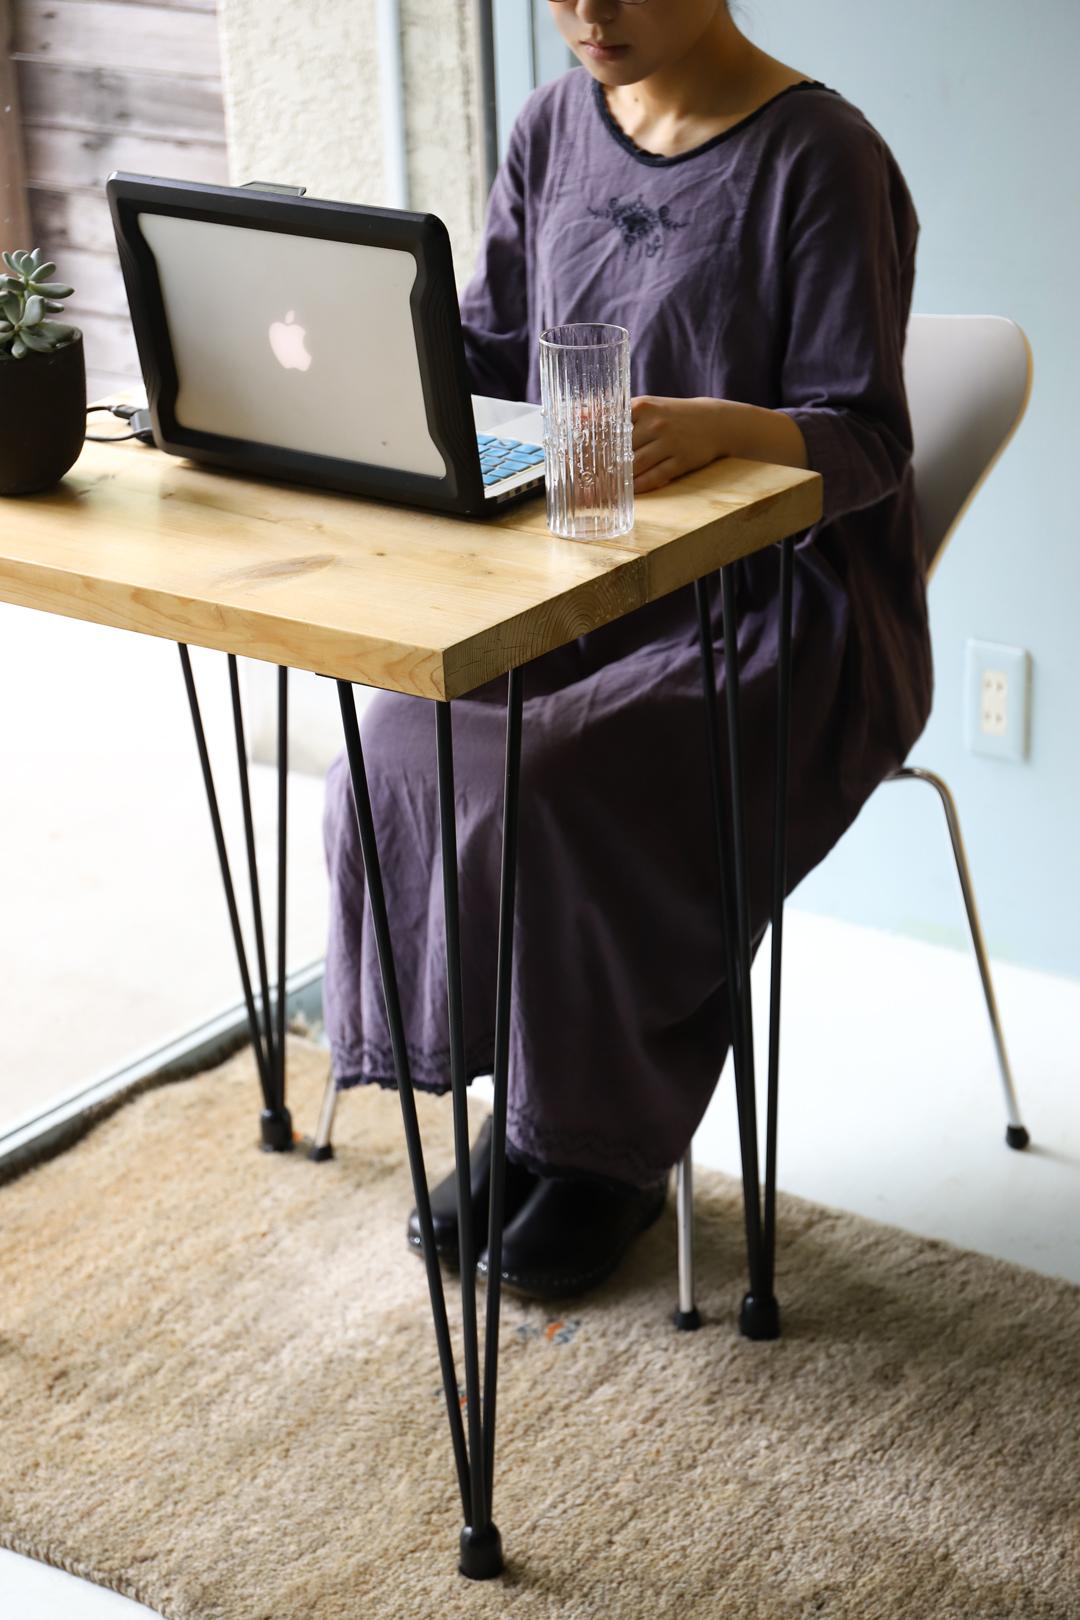 Reclaimed Wood Remake Table Desk/リメイク テーブル 古材 デスク アイアン シンプル インダストリアル